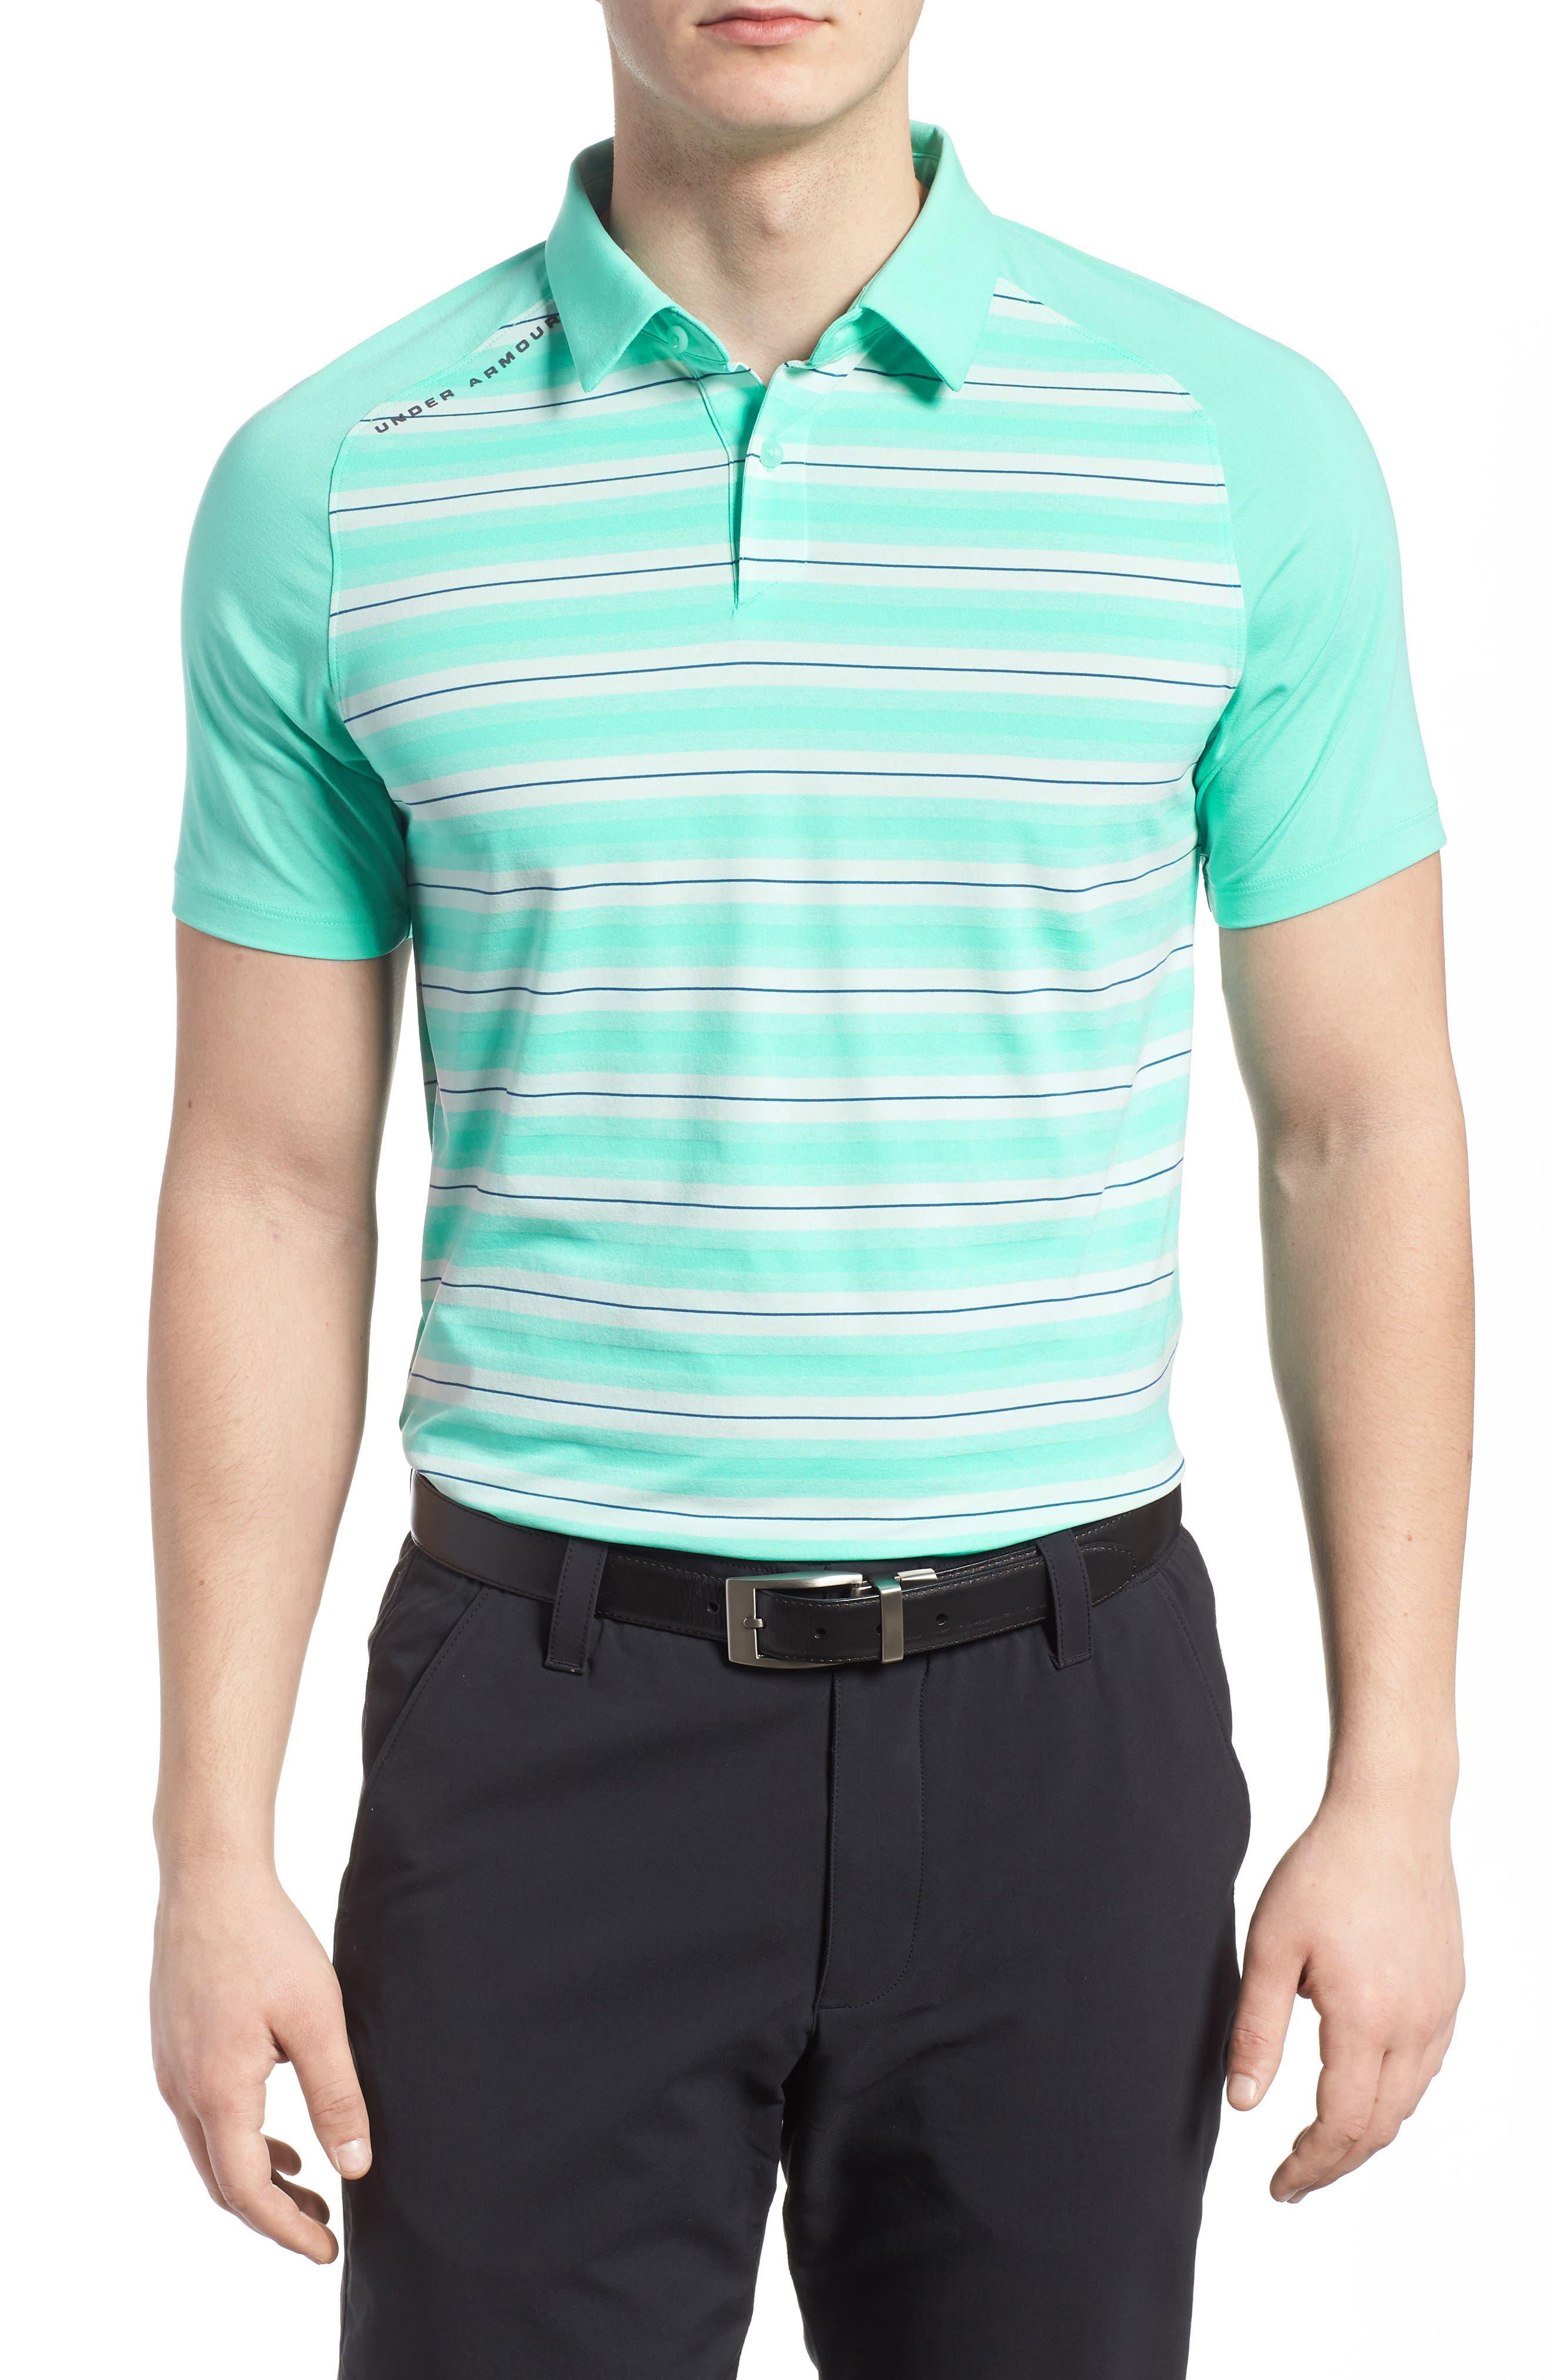 Main Image - Under Armour Threadborne Boundless Regular Fit Polo Shirt